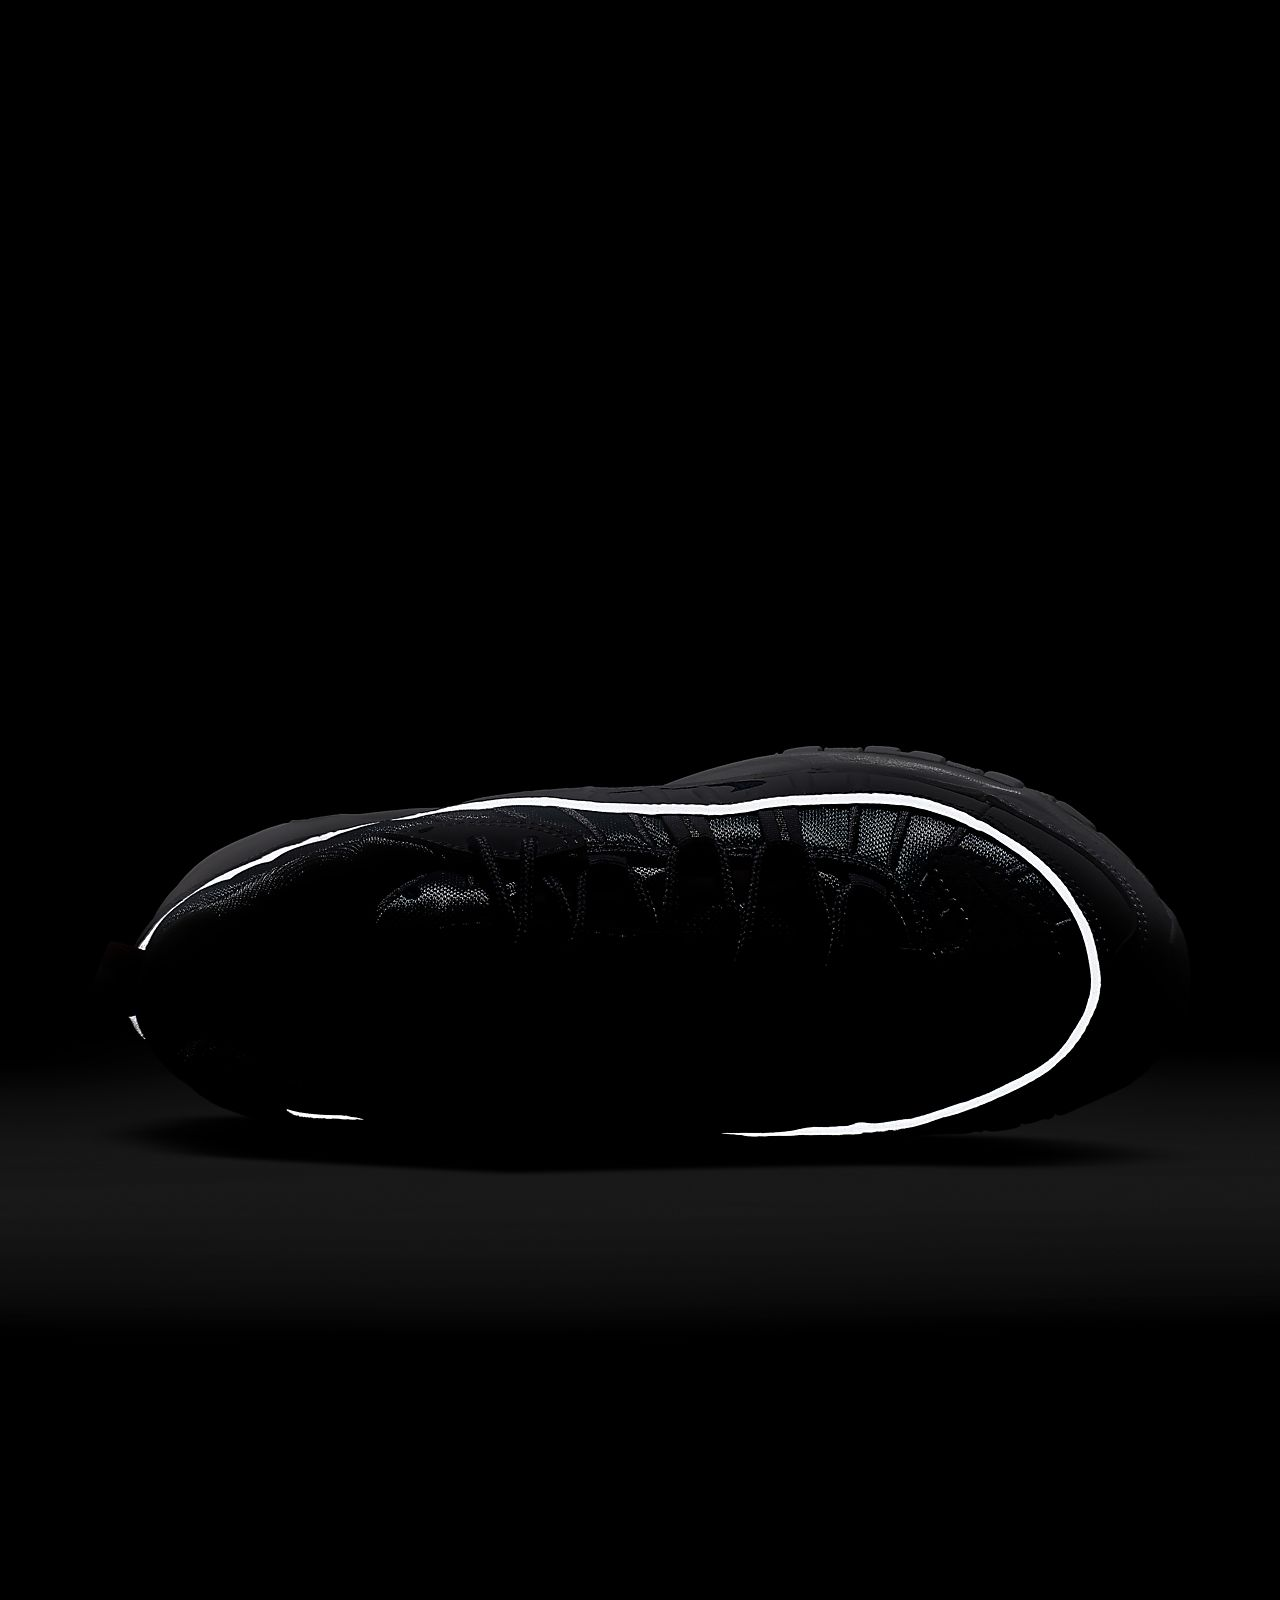 Calzado para mujer Nike Air Max 98 Premium Unité Totale